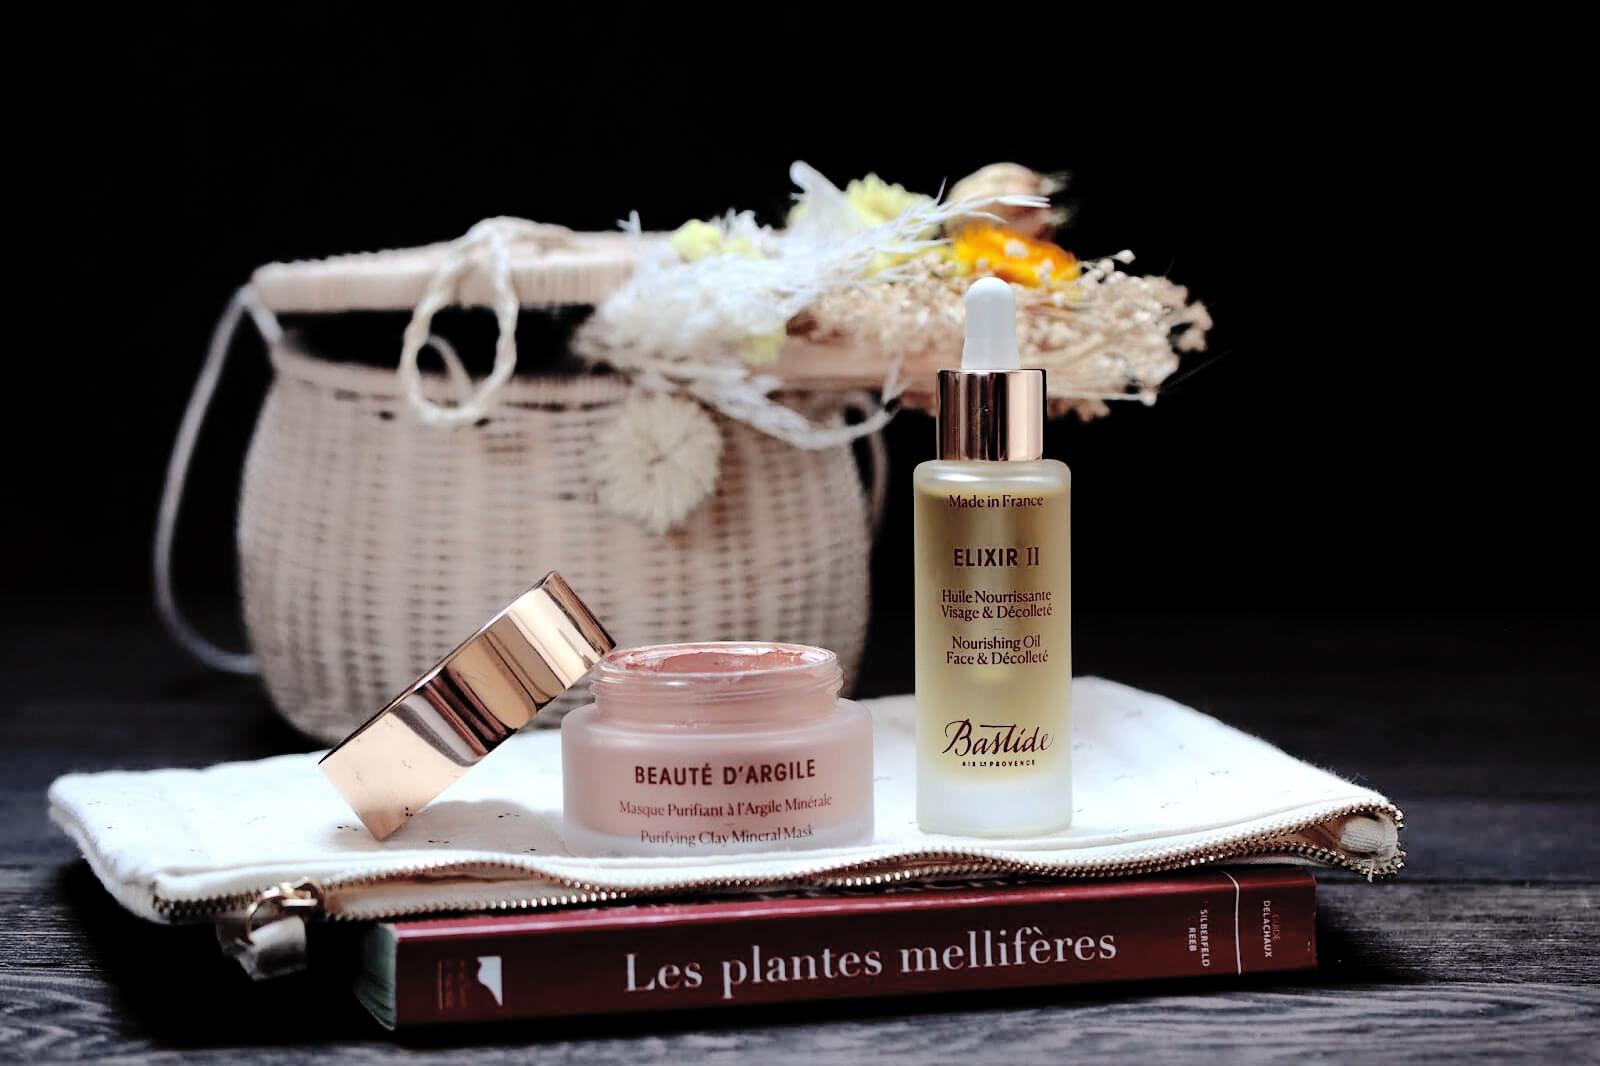 bastide-soins-visage-masque-purifiant-elixir-II-huile-visage-avis-test-composition